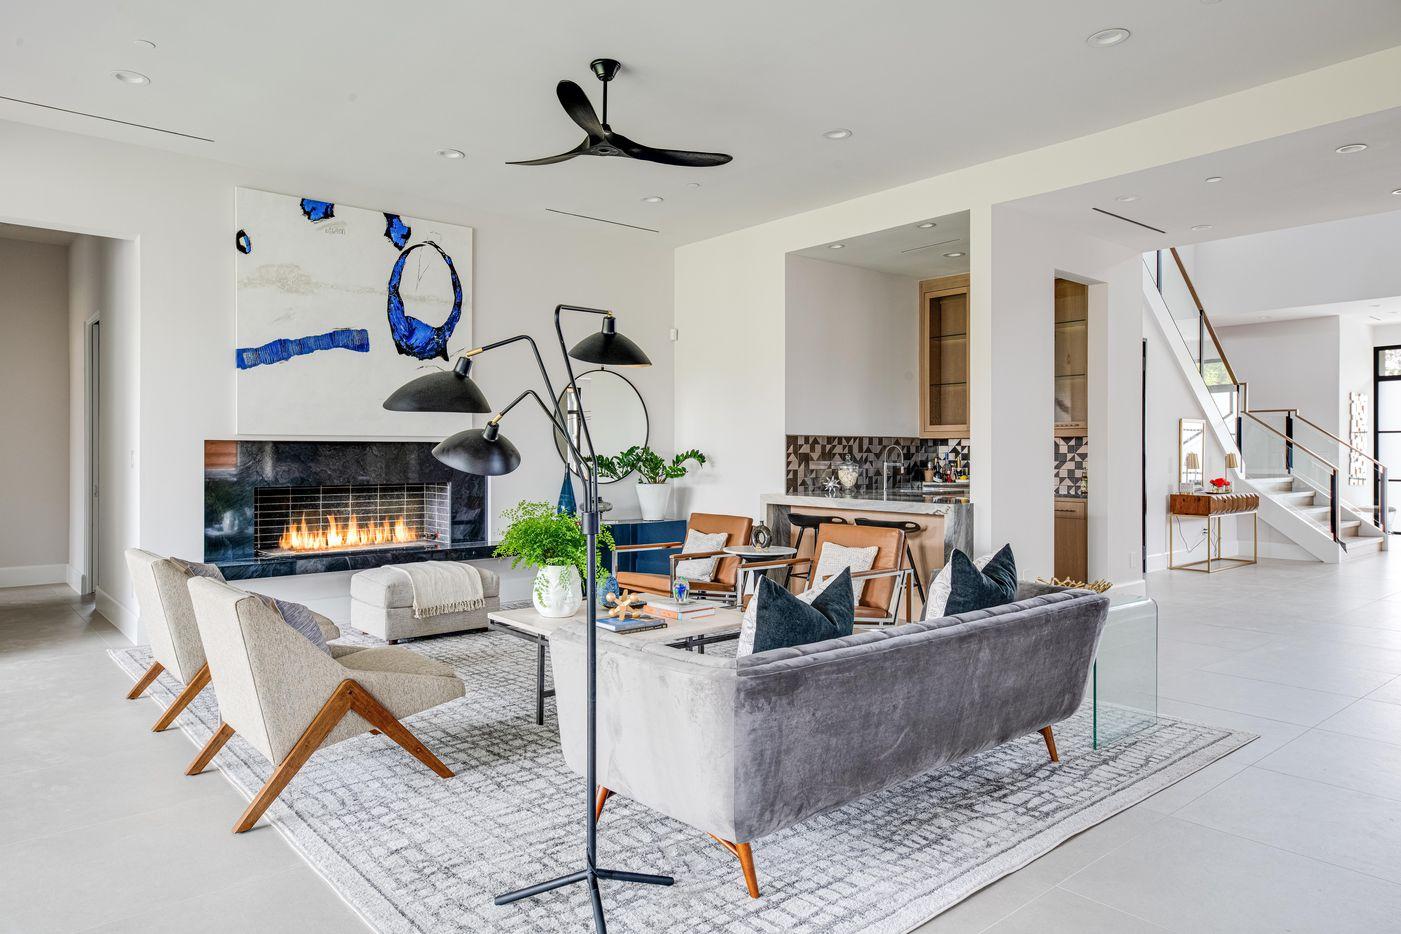 Take a look inside the home at 6426 Azalea Lane in Dallas, TX.